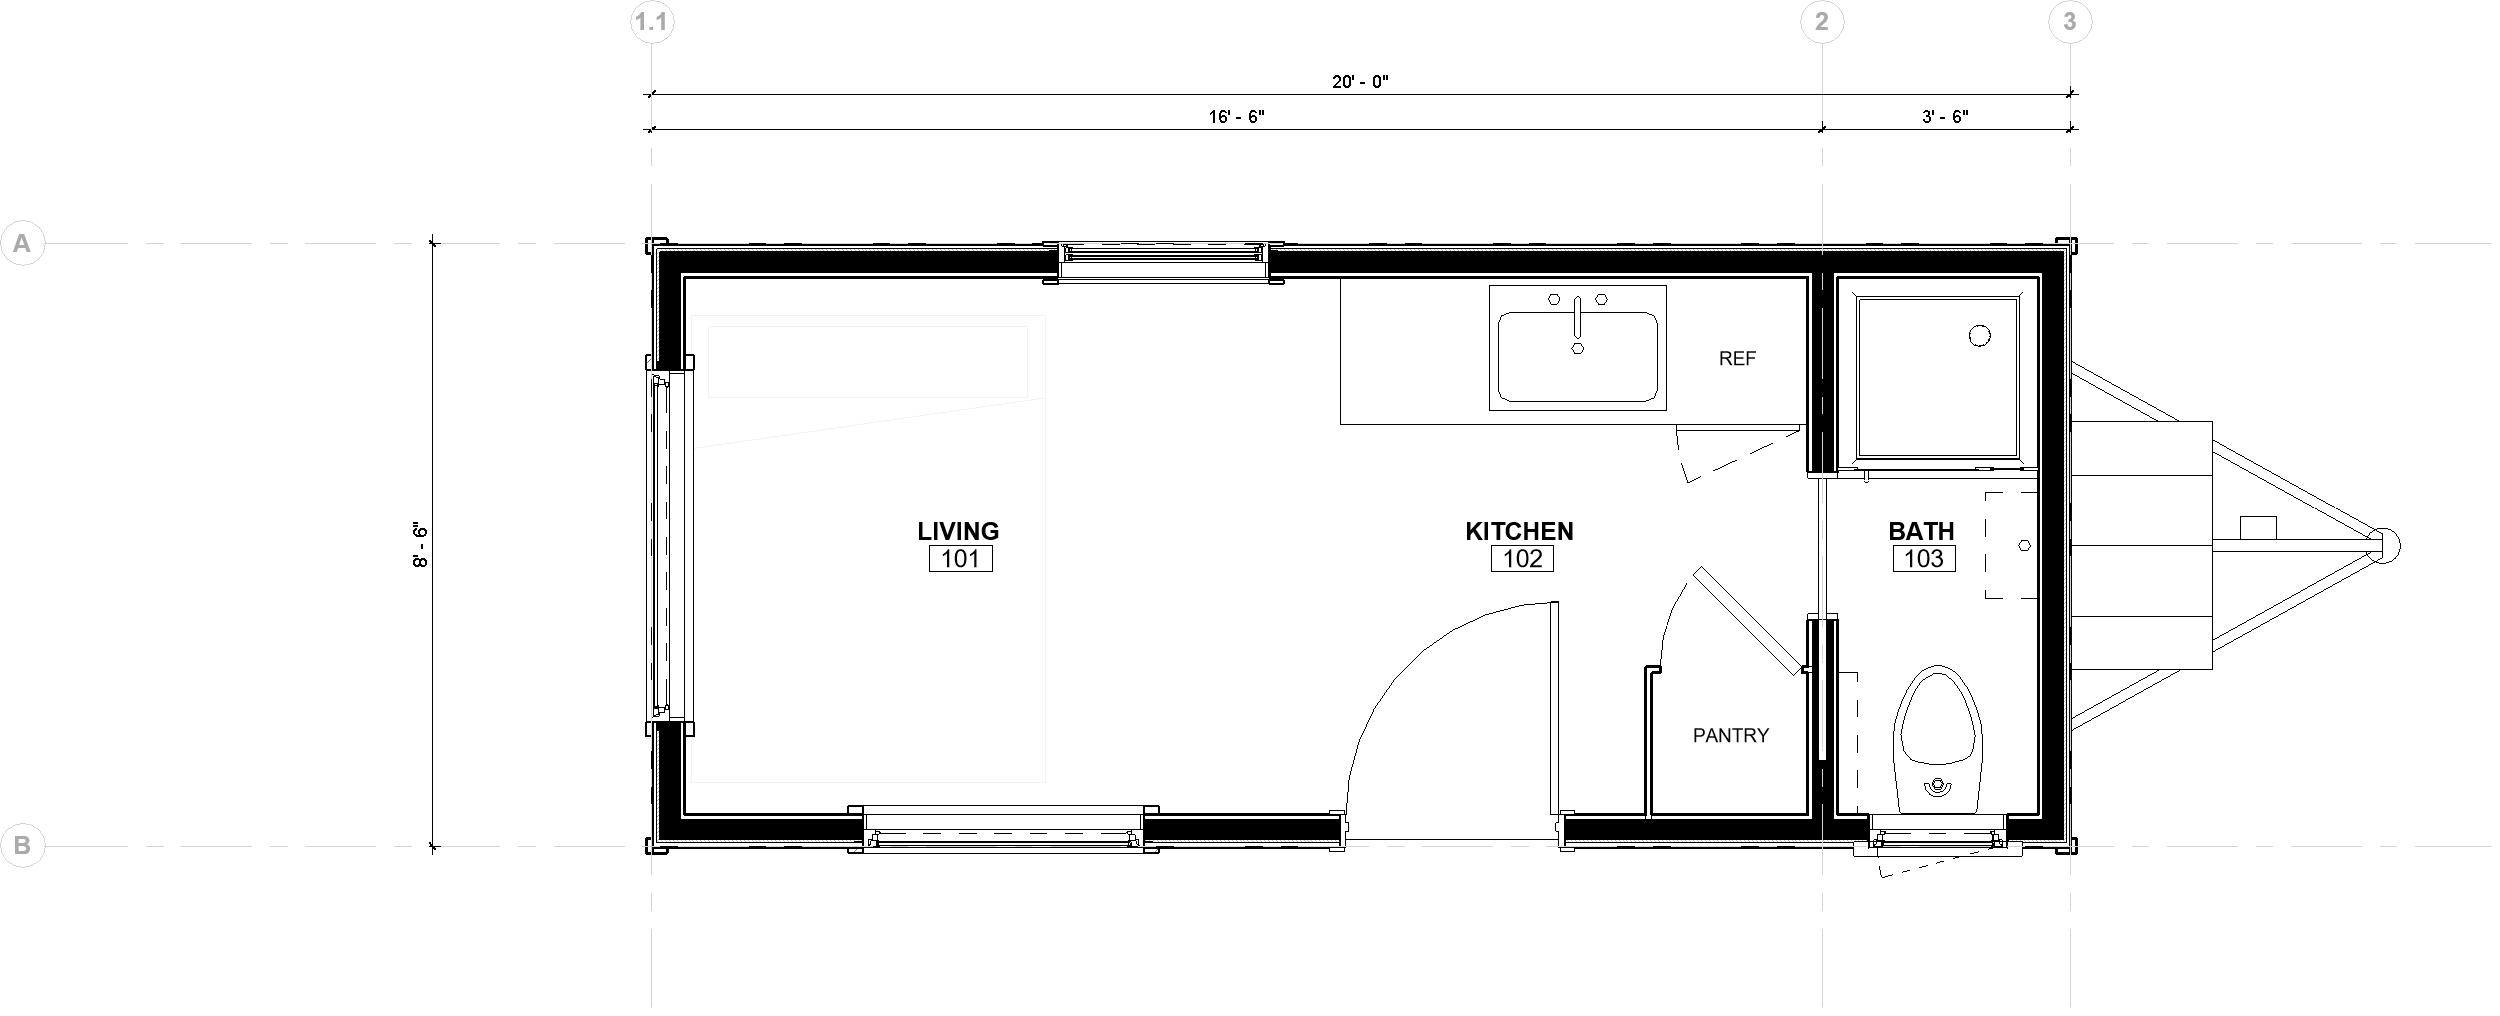 The 20' Minimalist Floor Plan- dimensions